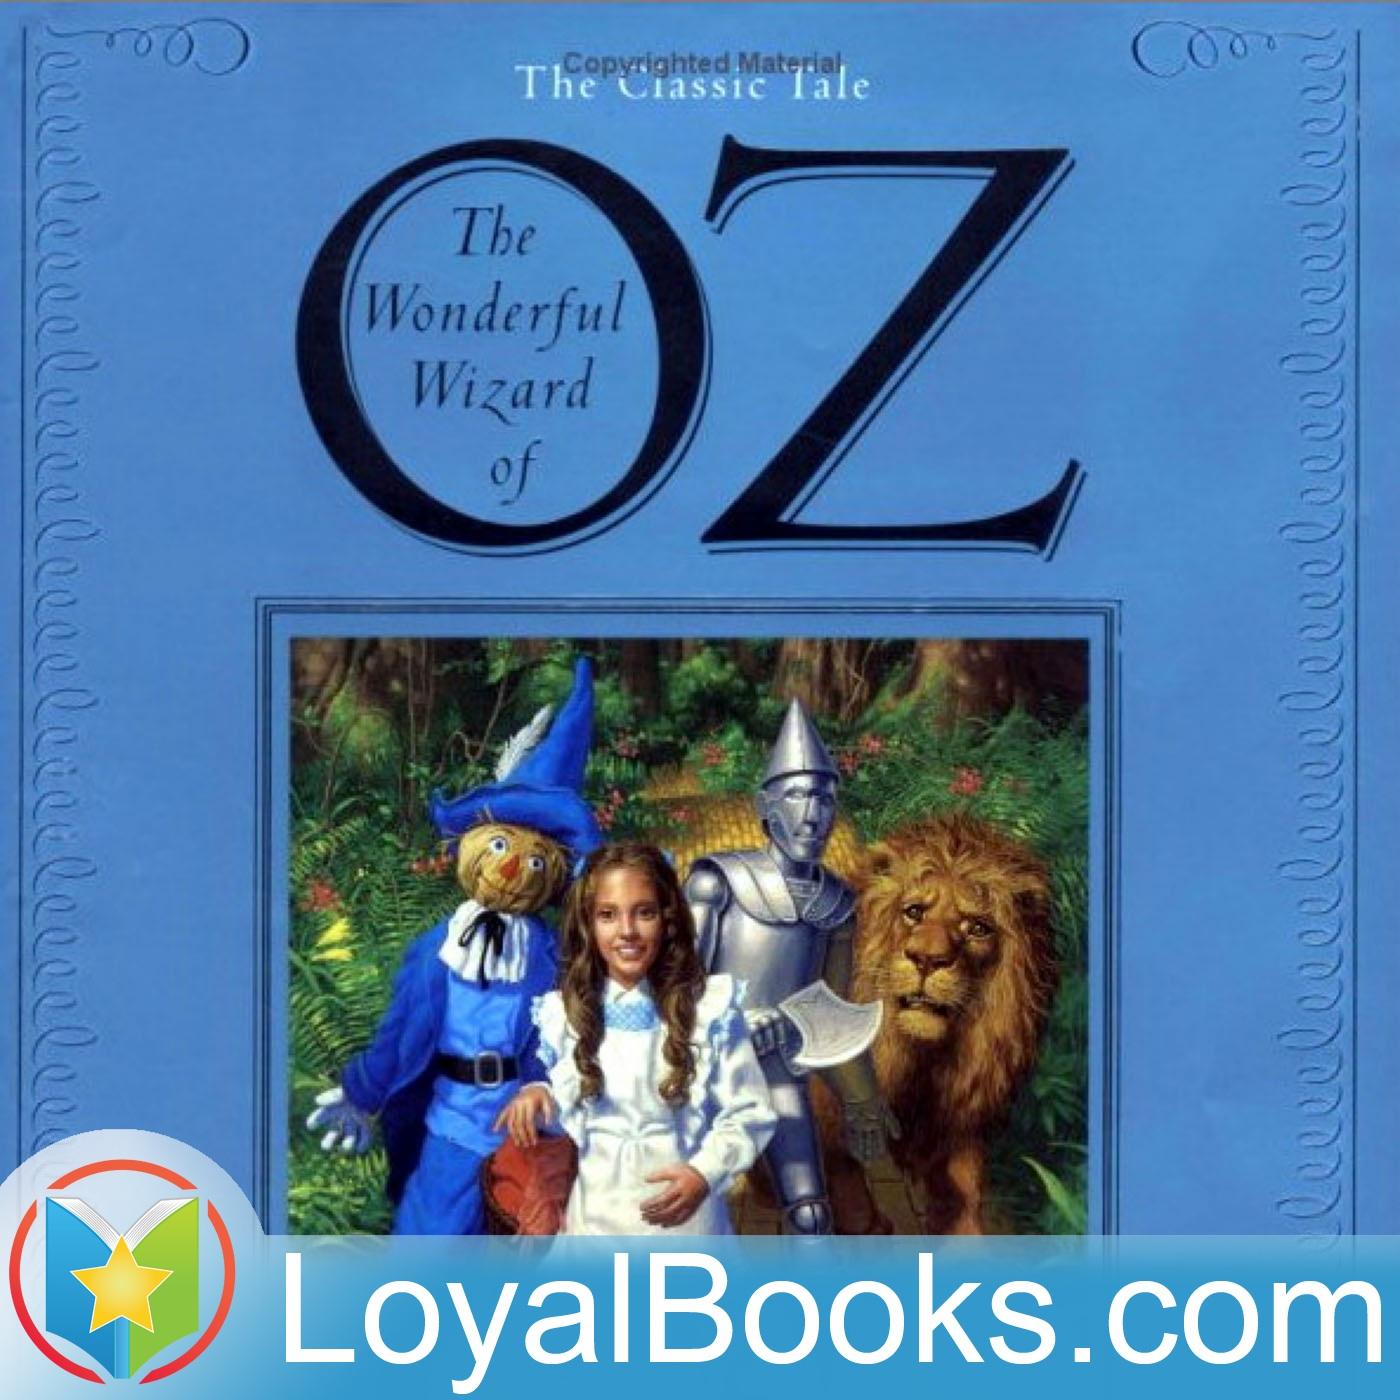 <![CDATA[The Wonderful Wizard of Oz by L. Frank Baum]]>